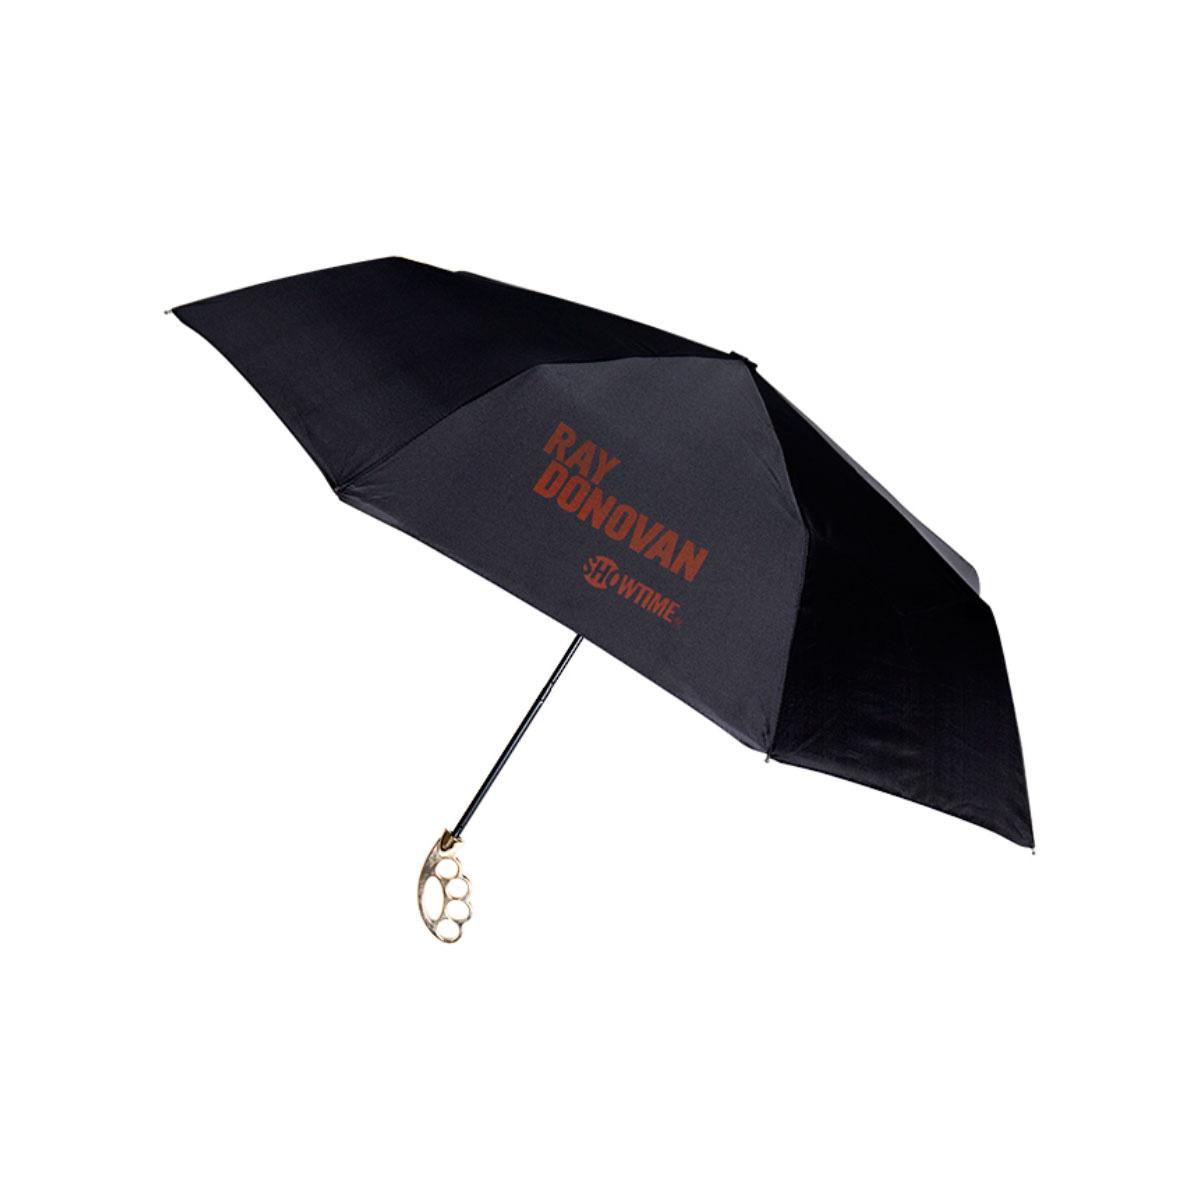 Ray Donovan Knuckles Umbrella